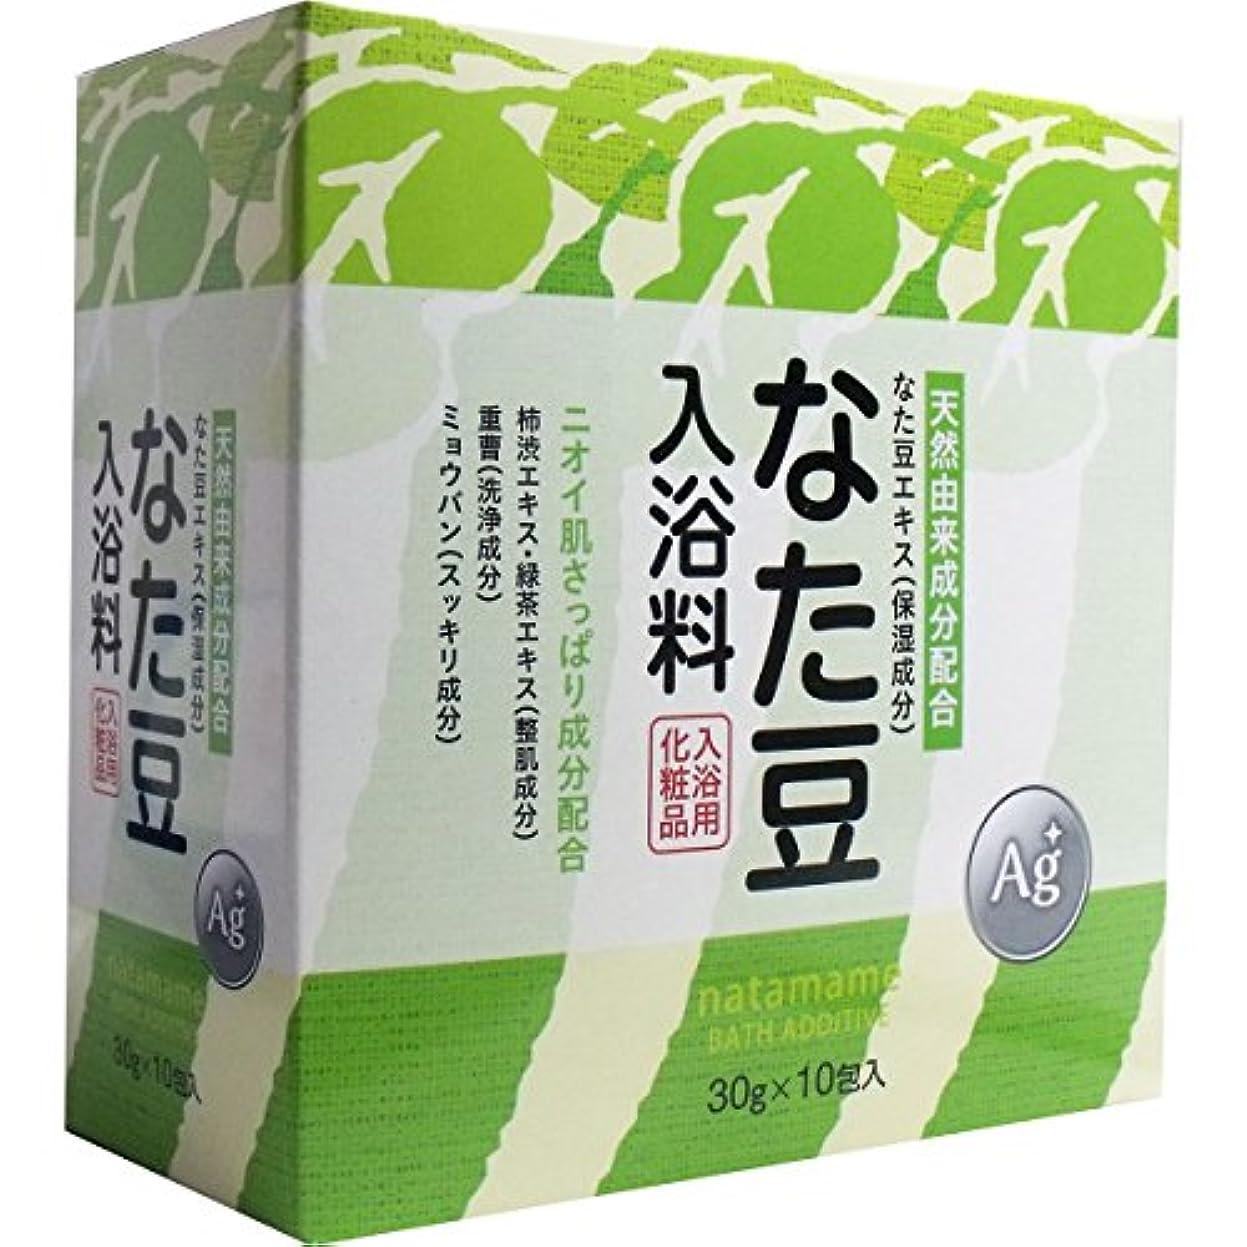 店員慢自動なた豆入浴料 入浴用化粧品 30g×10包入×5